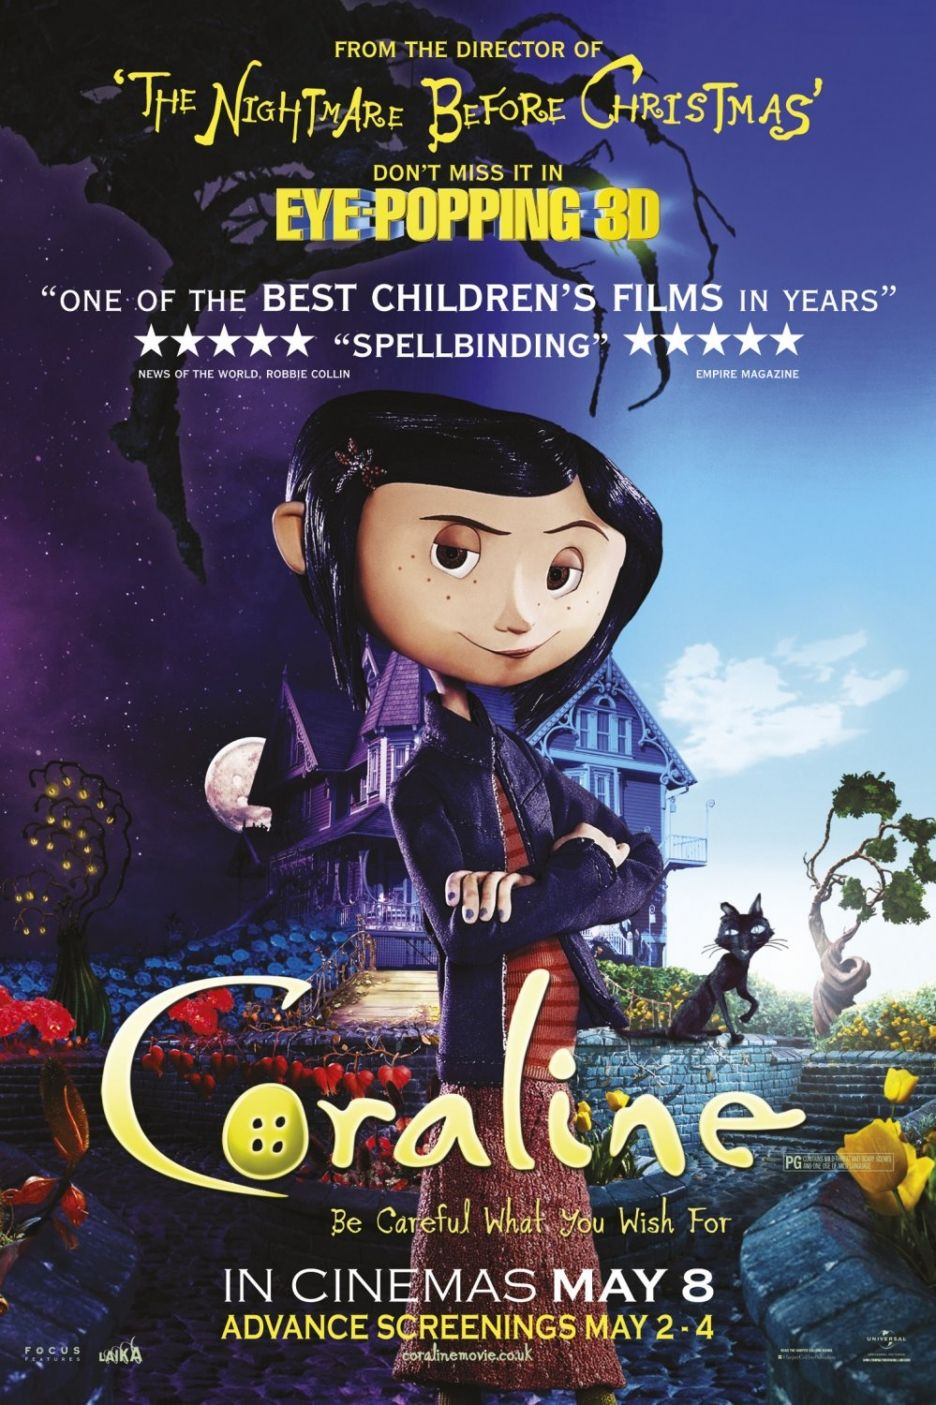 Coraline Animated movie posters, Halloween movies